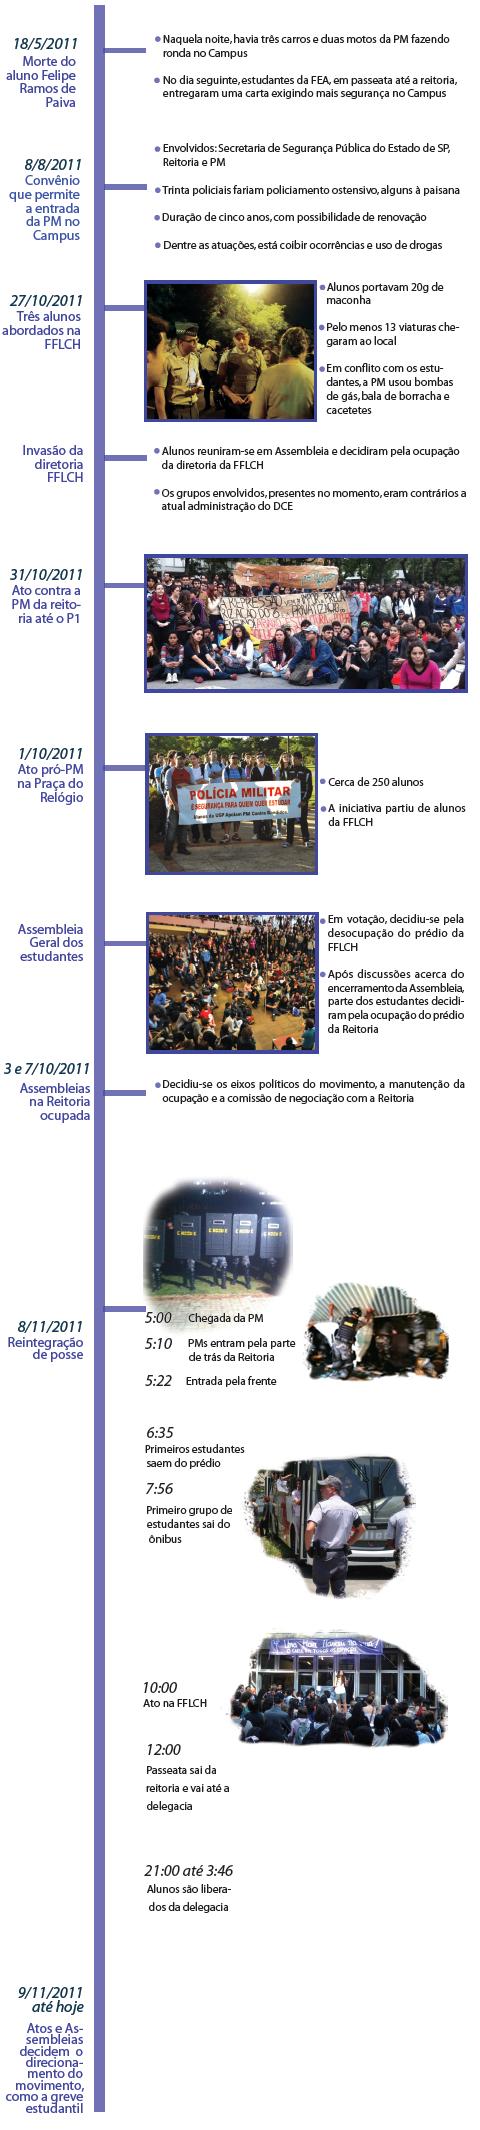 Cronologia (infográfico: Beatriz Montesanti, Bruno Federowski e Isadora Bertolini)